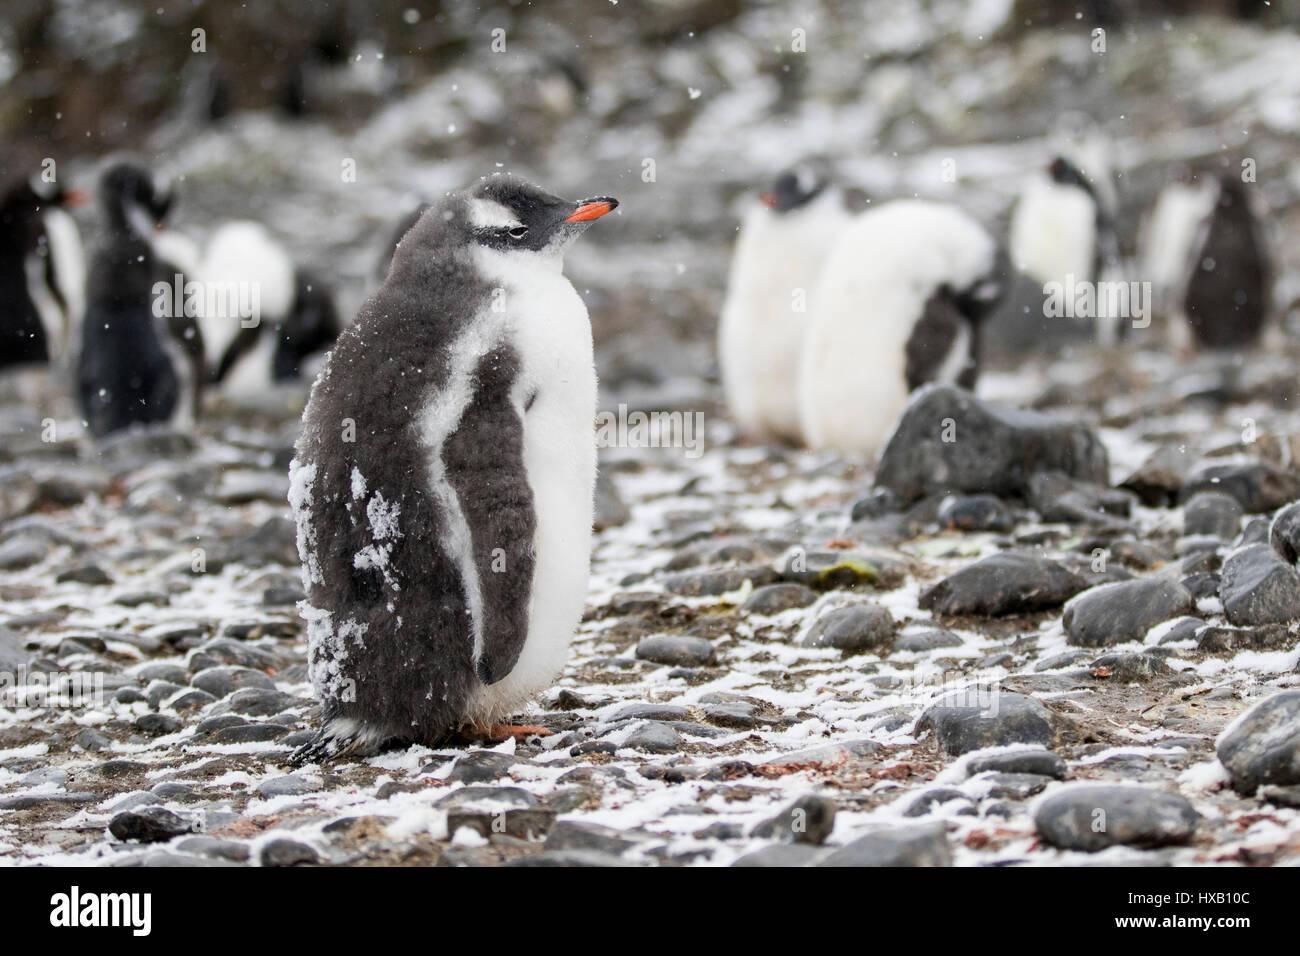 Penguin chick, chicks. Gentoo penguins Antarctica. - Stock Image